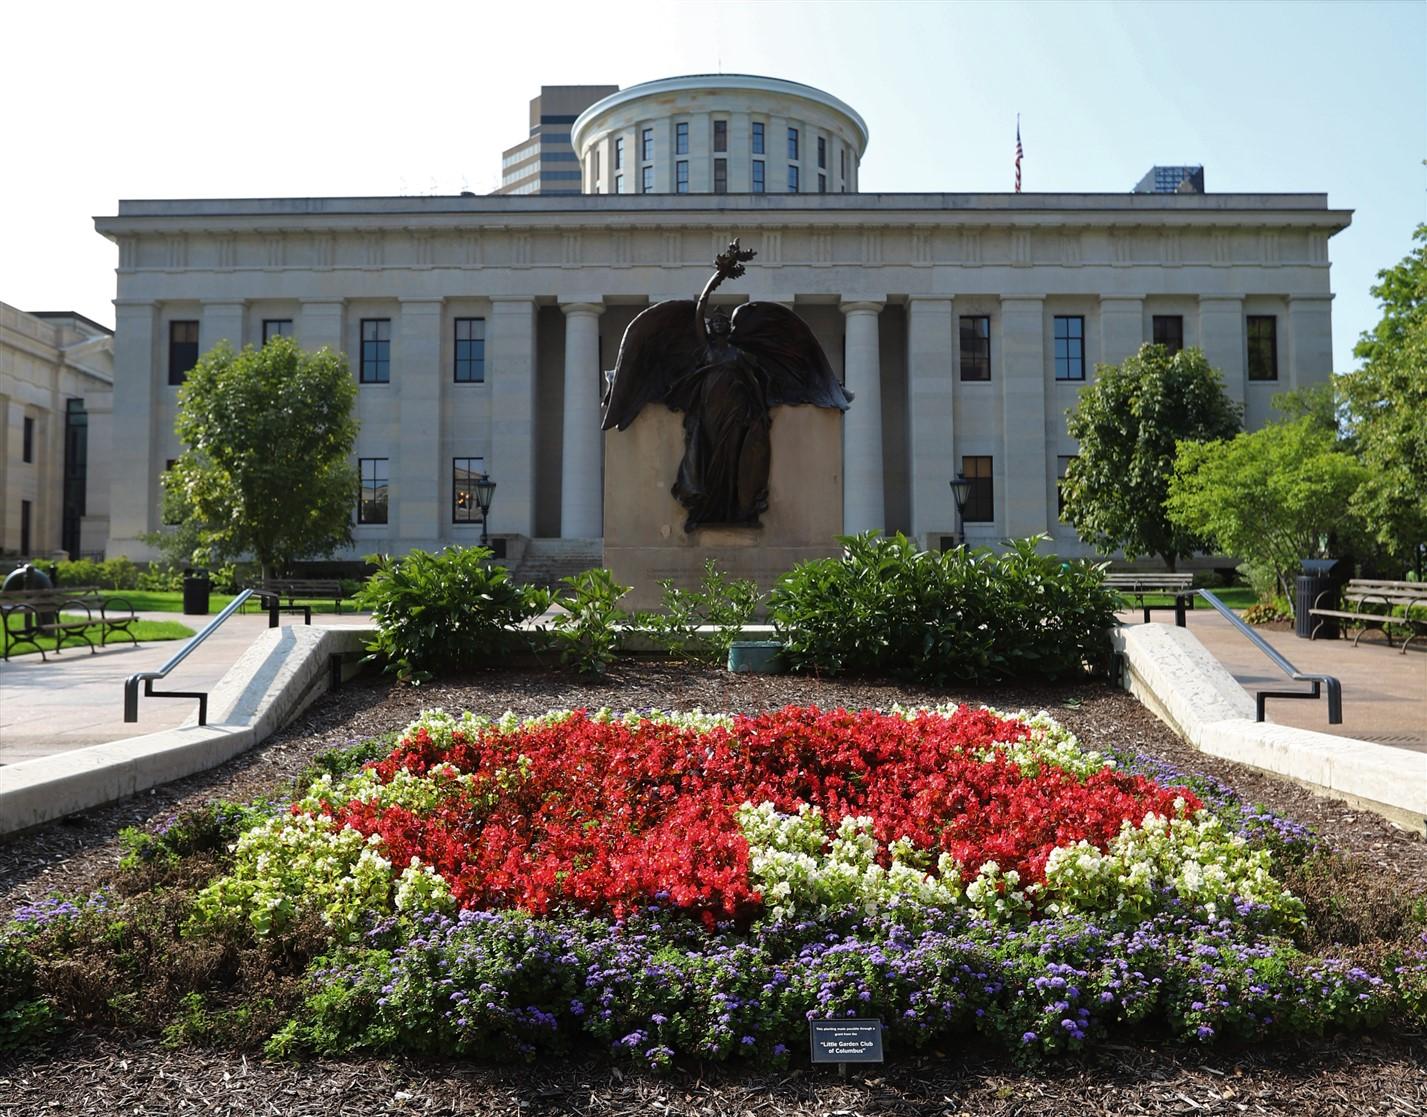 2018 08 19 41 Columbus Statehouse Grounds